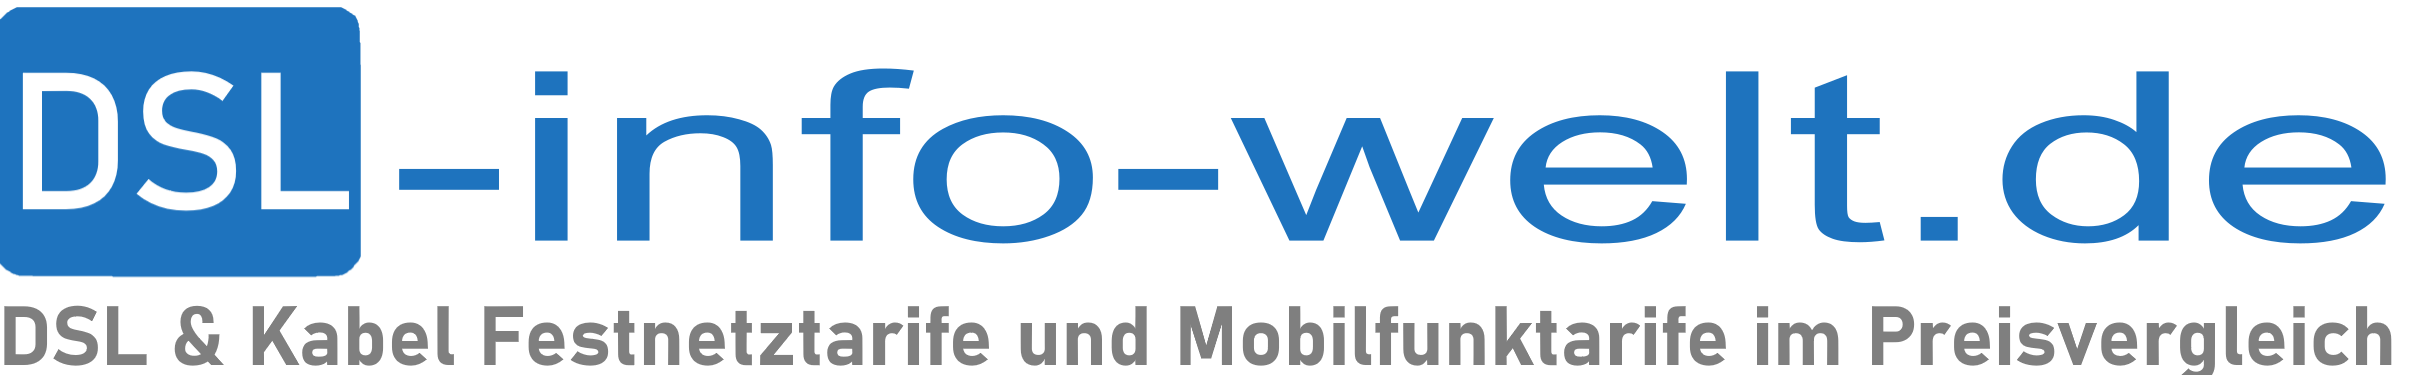 Logo DSL Info Welt Preisvergleich